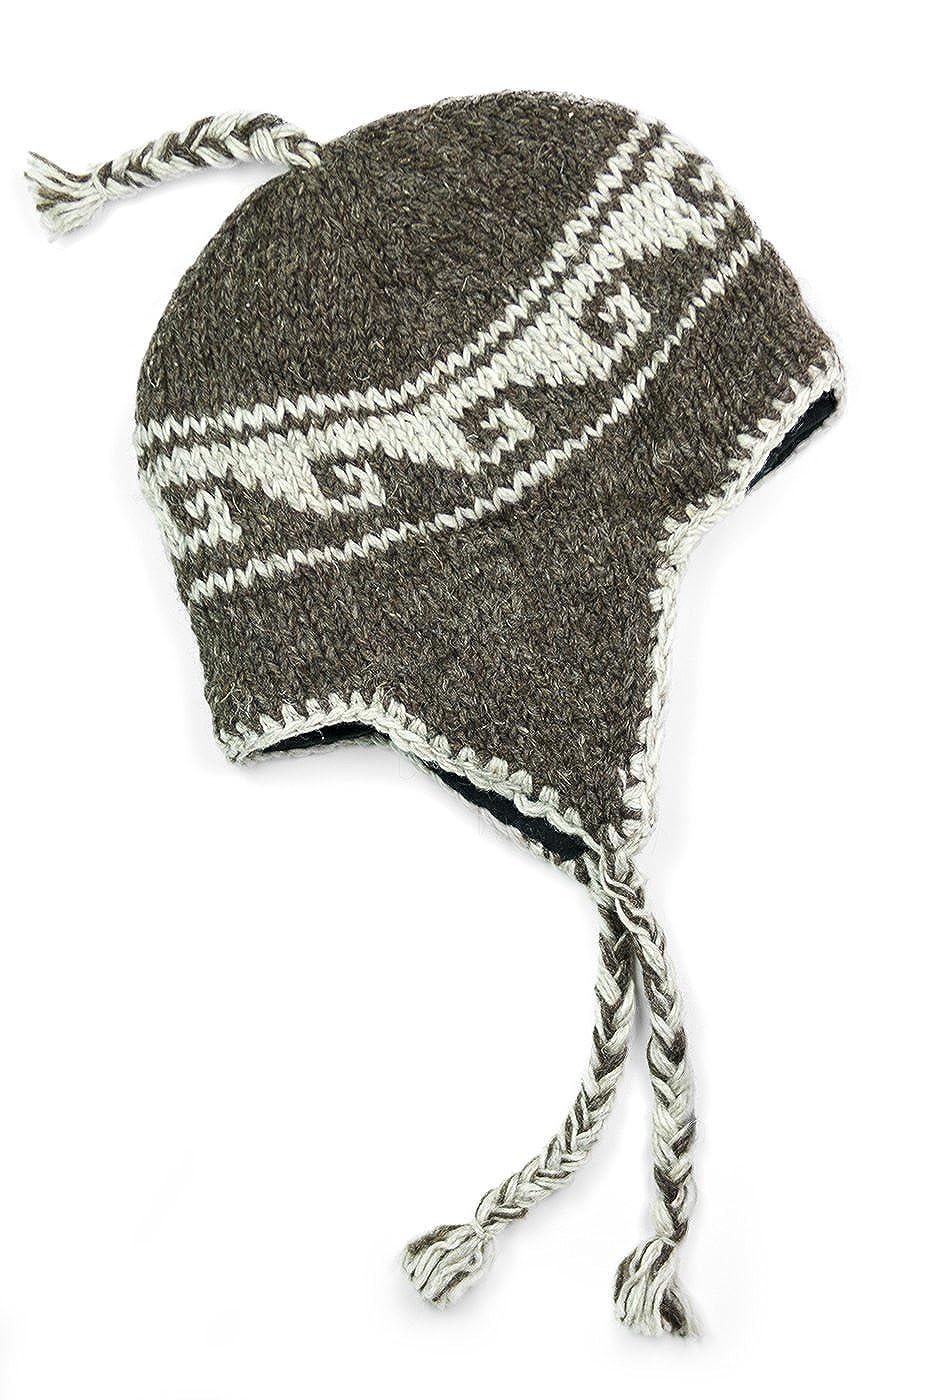 Three Cranes Gallery Men s Wool Sherpa Hat - Natural Brown at Amazon ... 14a9faaed30